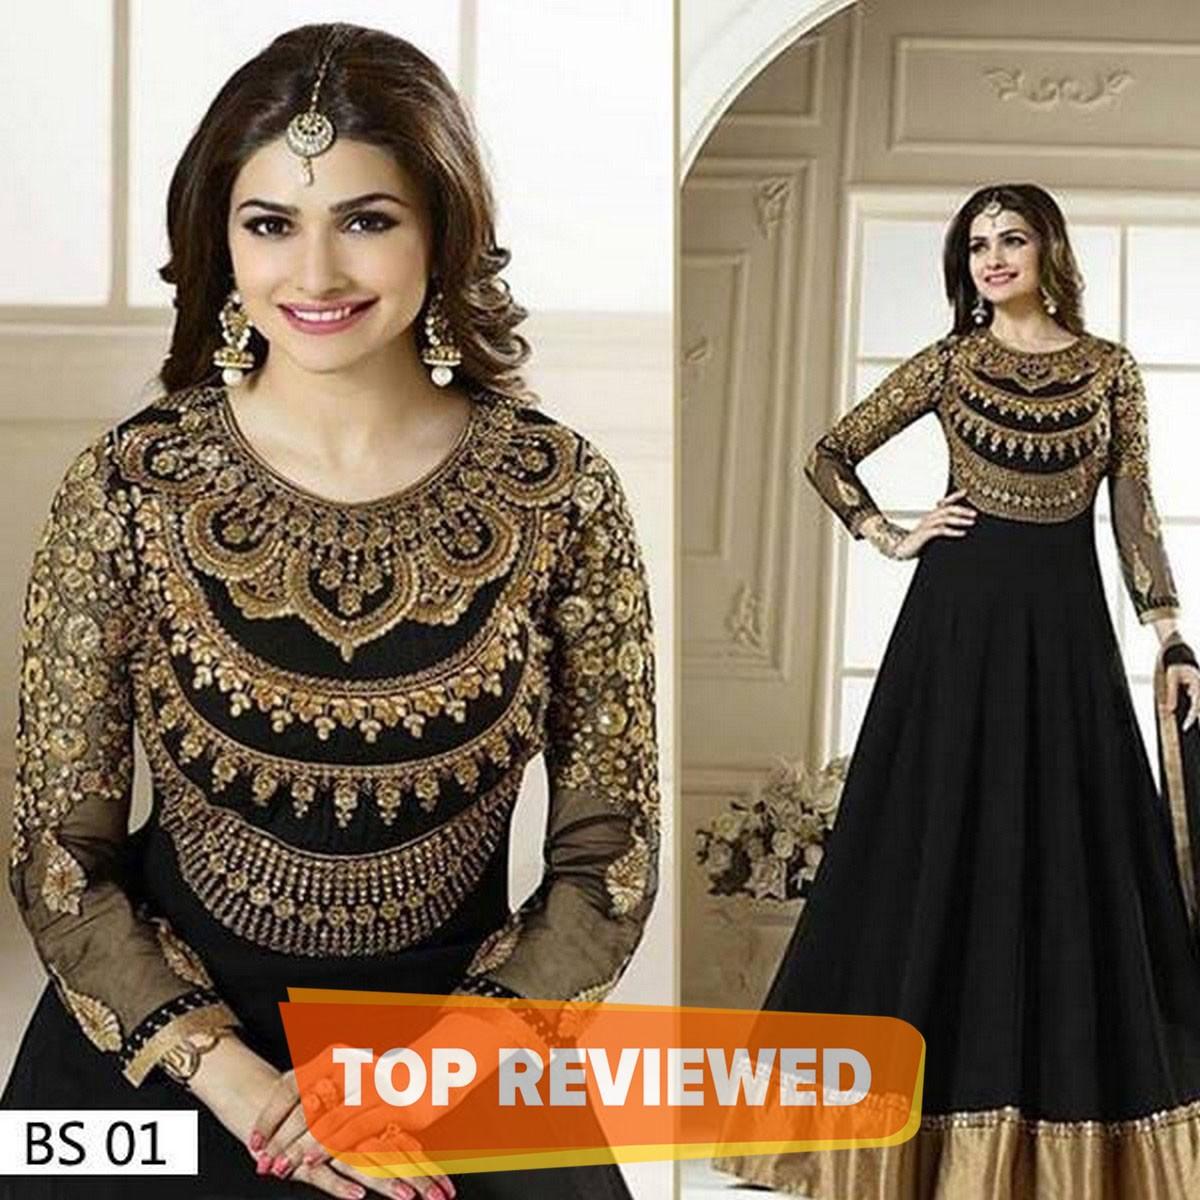 Black Chiffon Embroidered Semi Formal Dress